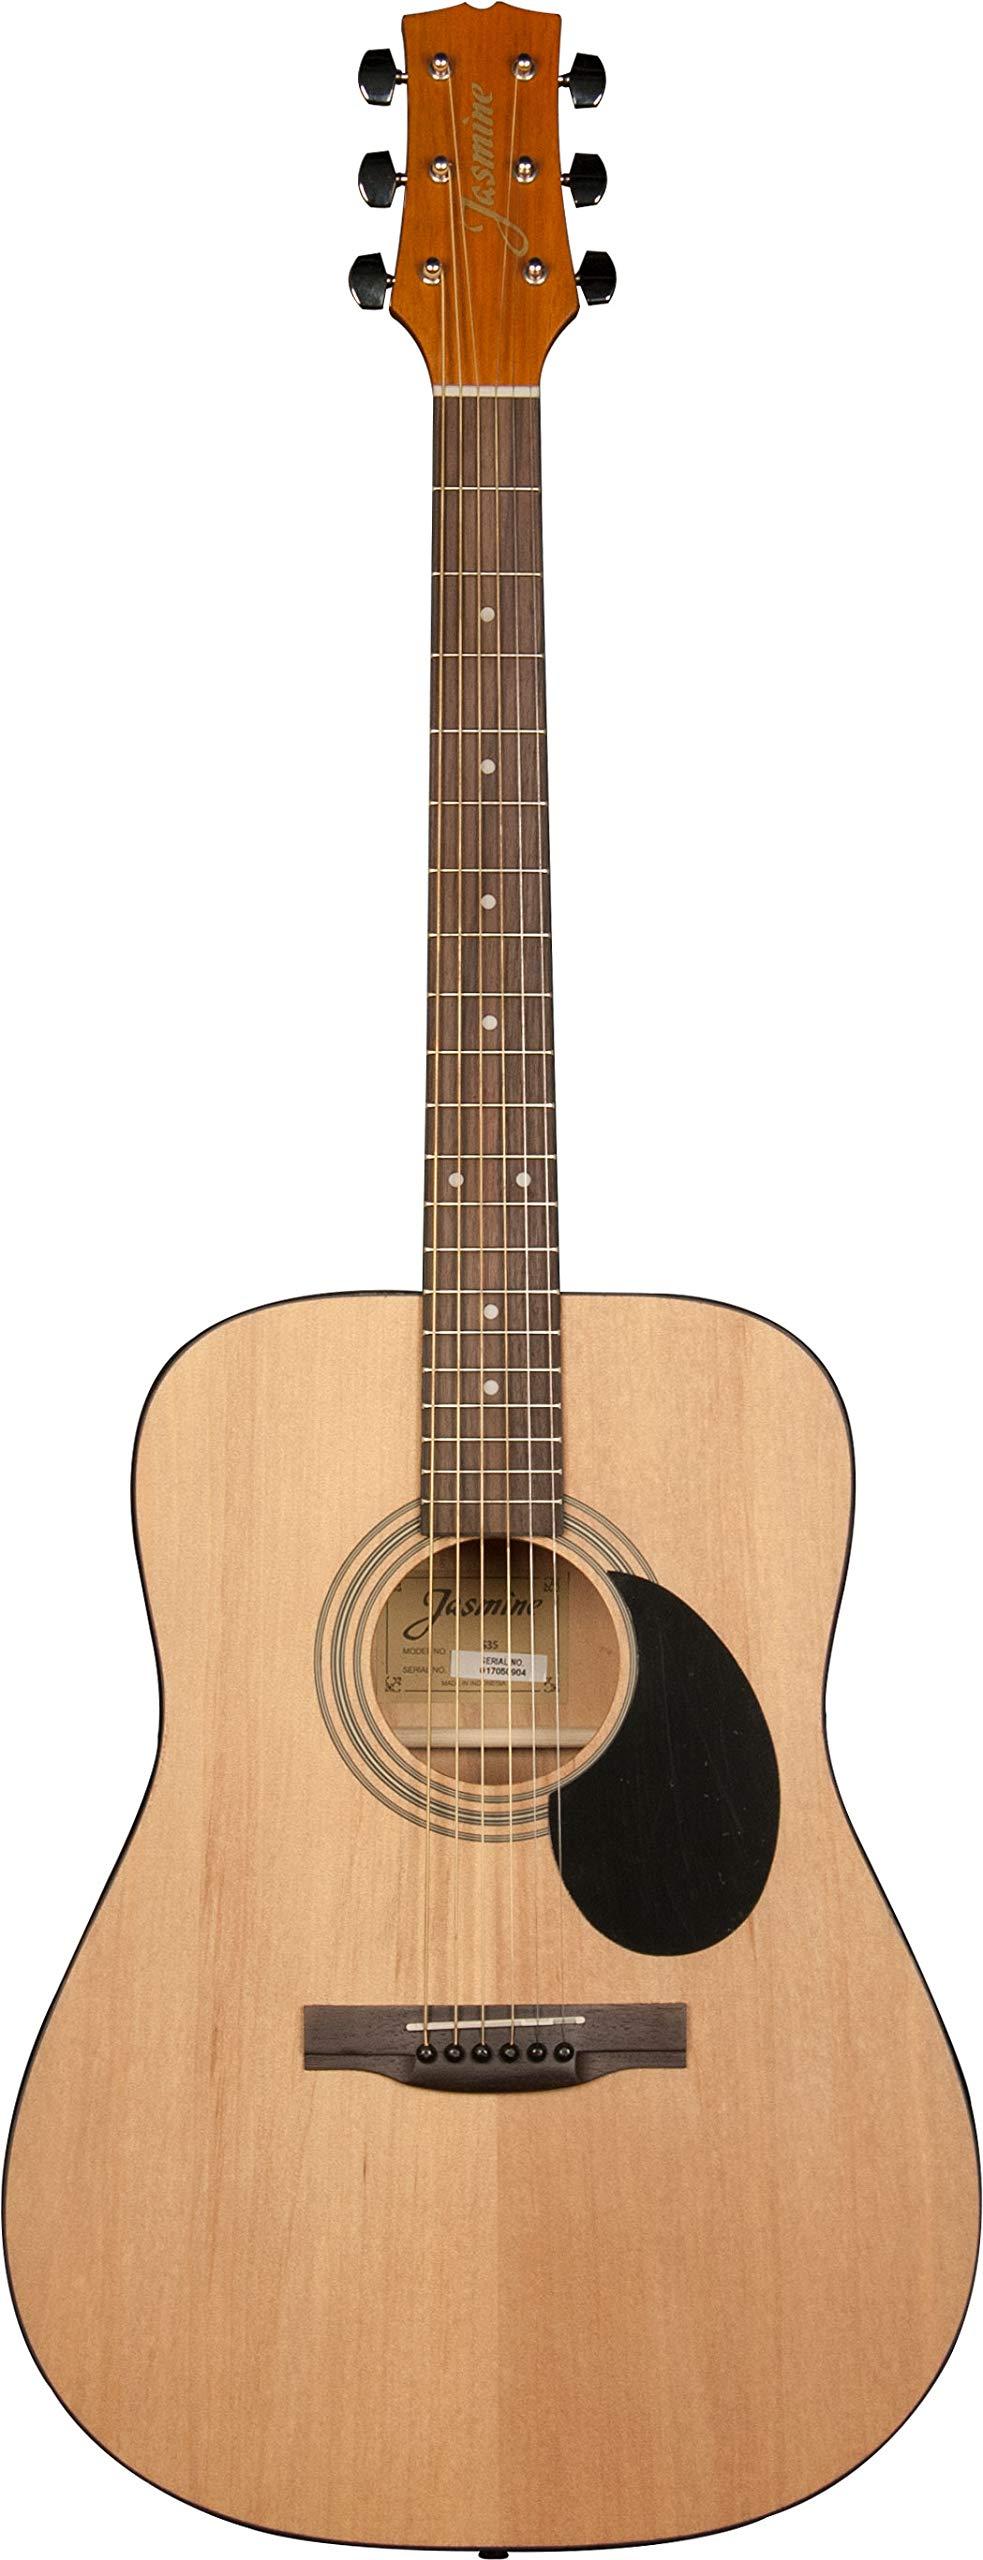 Jasmine S35 Acoustic Guitar, Natural by Jasmine